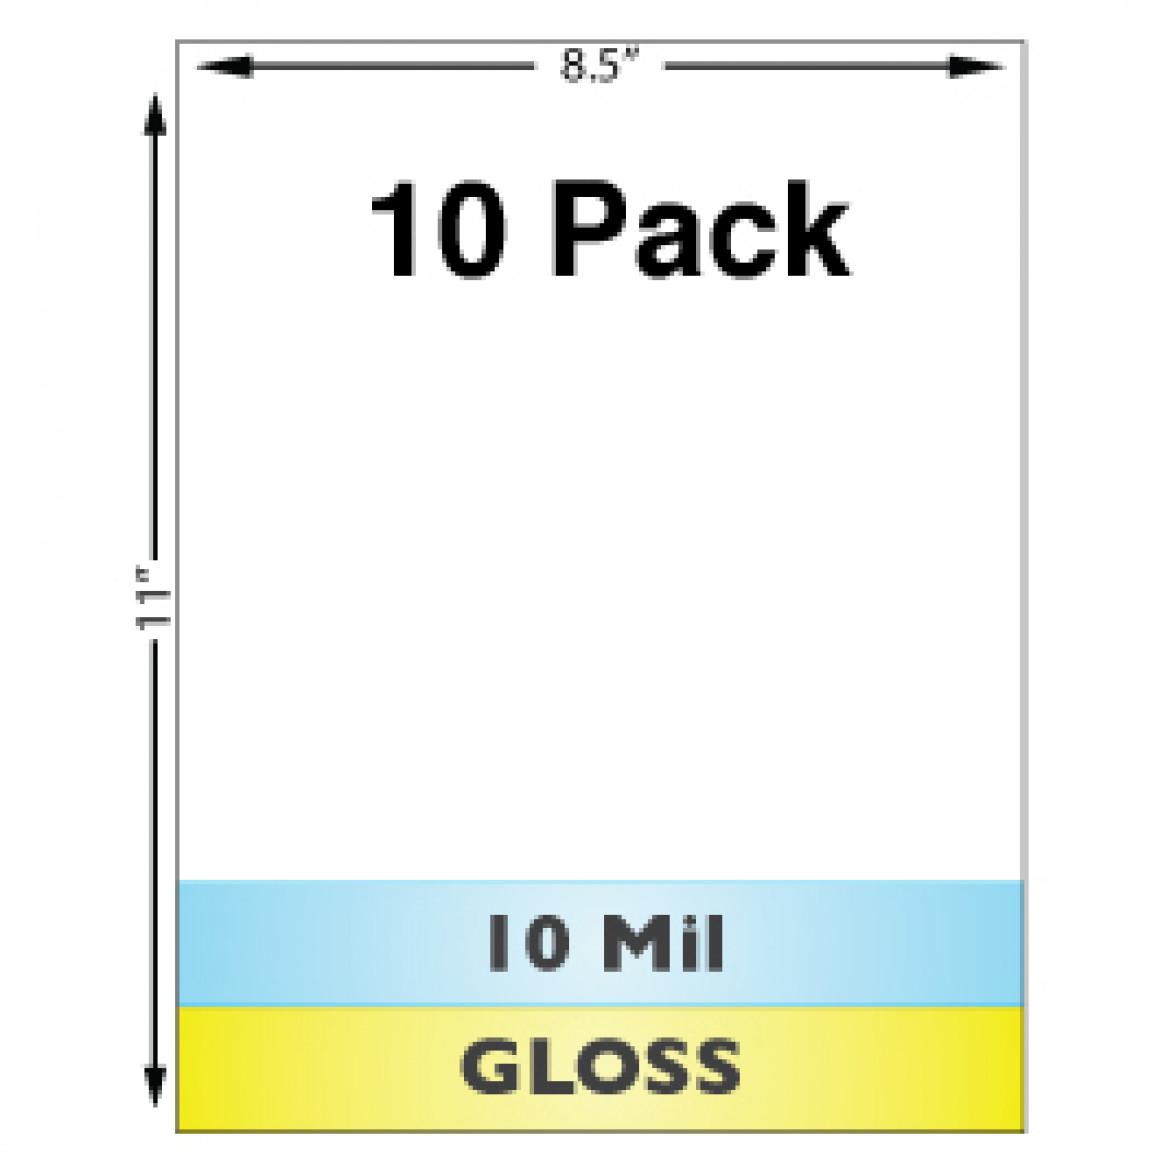 10 Mil Gloss Full Sheet Laminates - 10 Pack